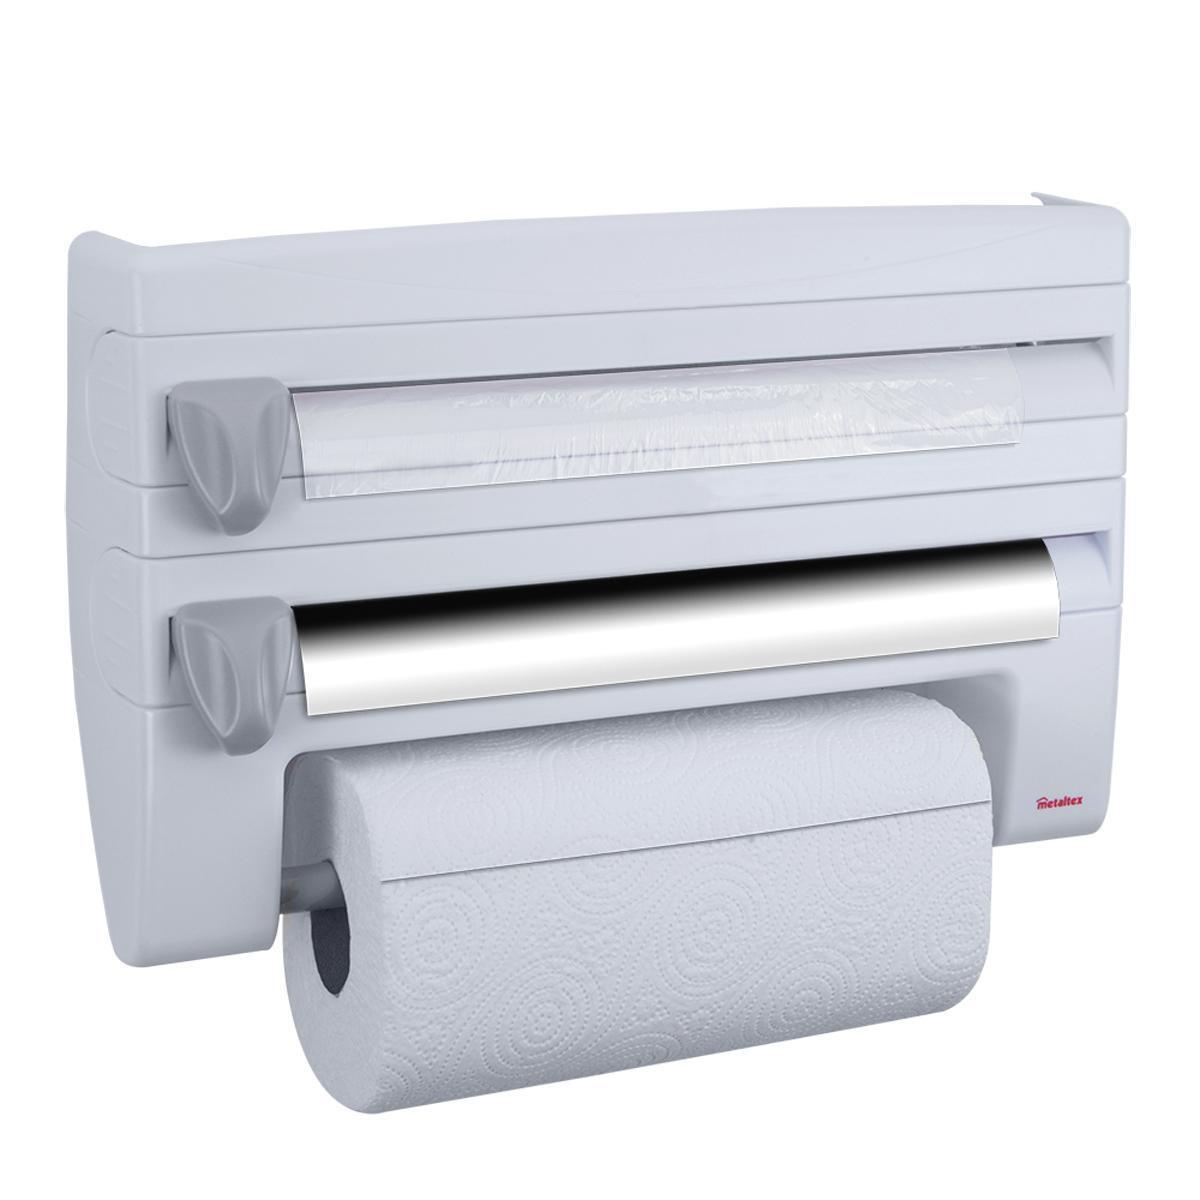 Porta rotolo carta assorbente Roll'n Roll in plastica L 39 x H 25 cm